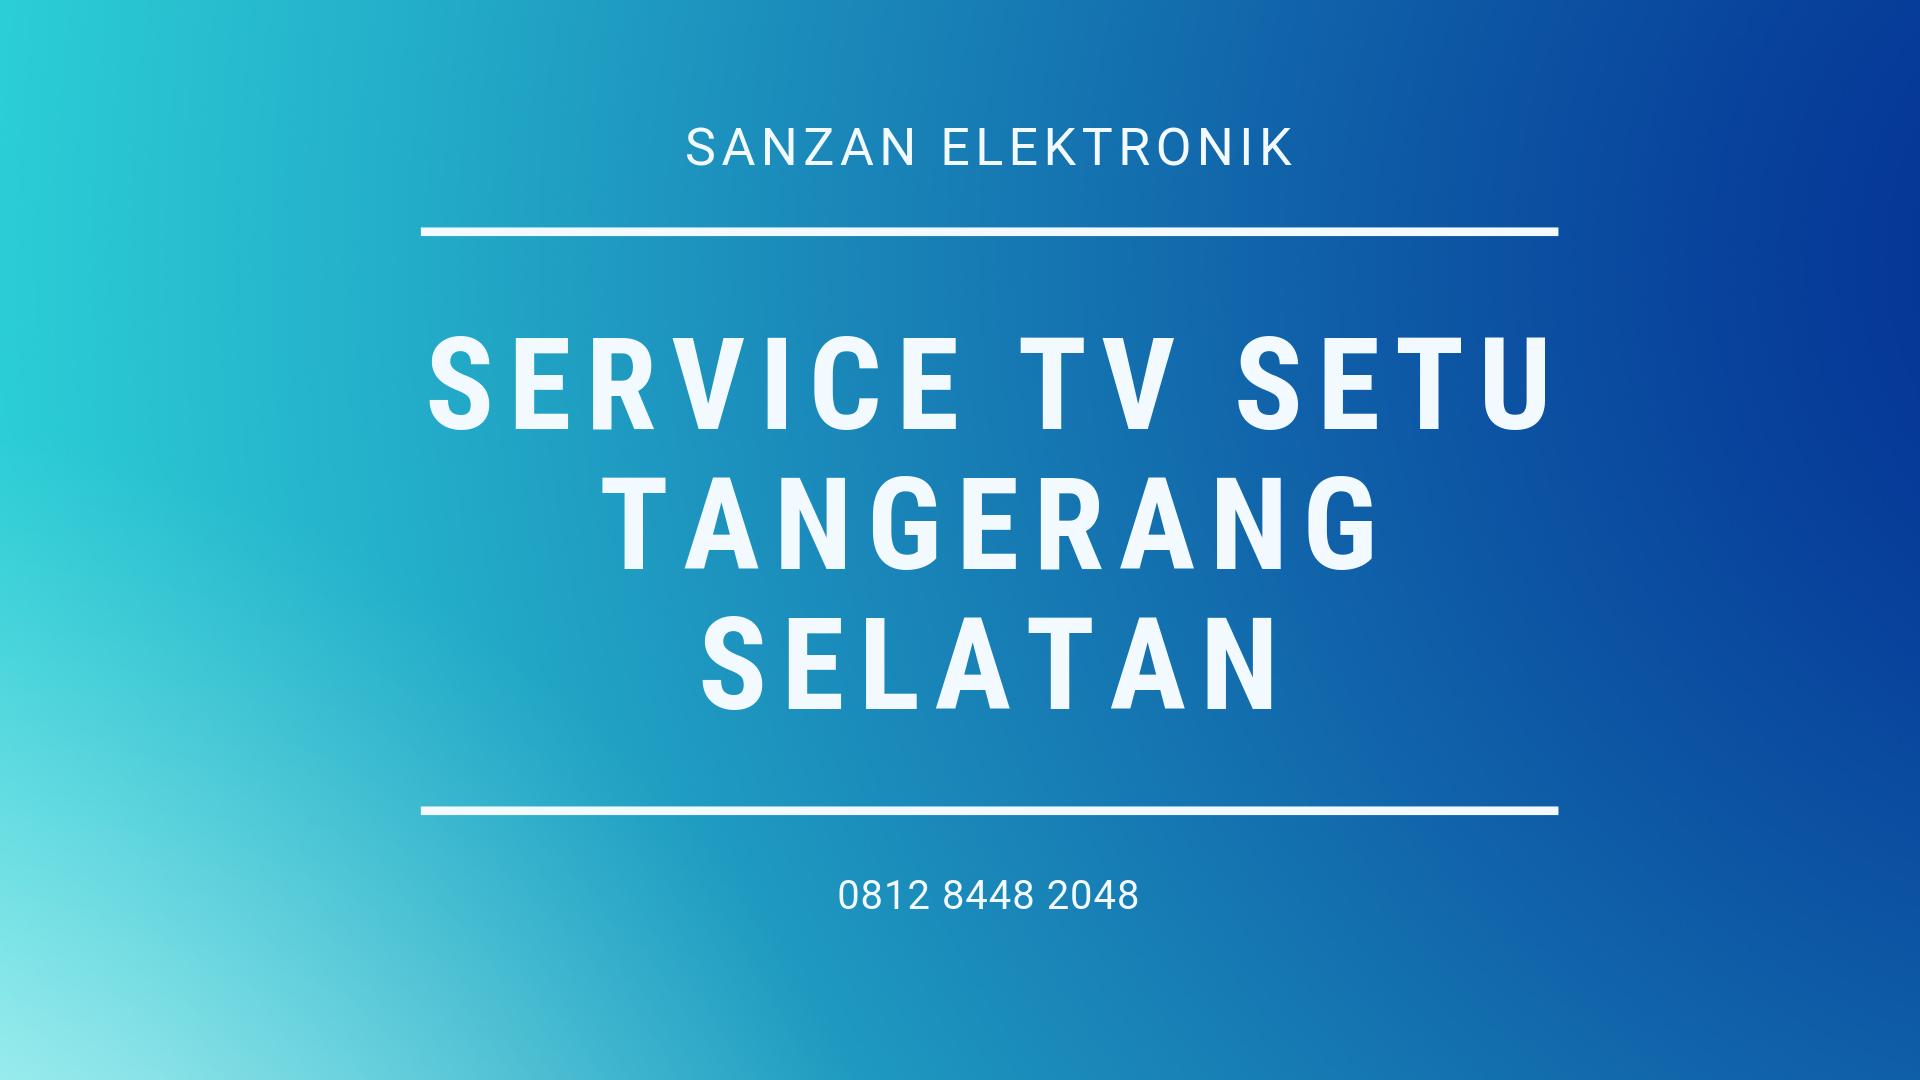 Service TV Setu Tangerang Selatan